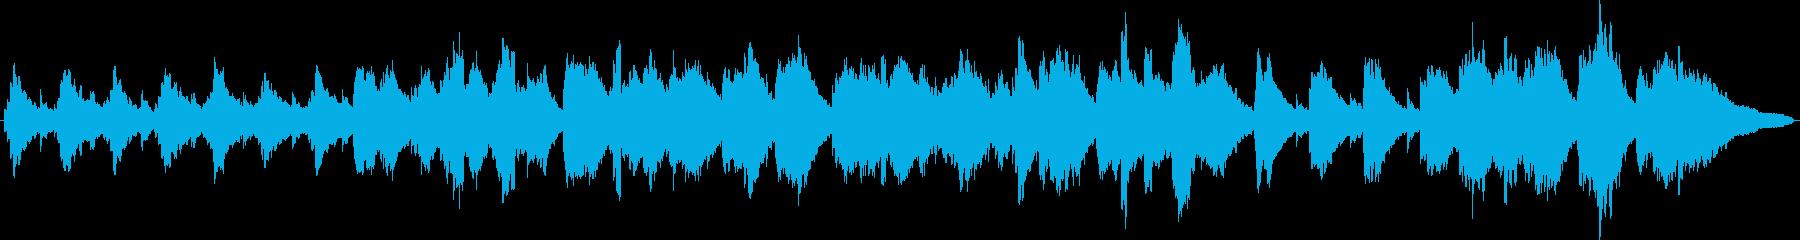 Sleepy Rhose 2の再生済みの波形